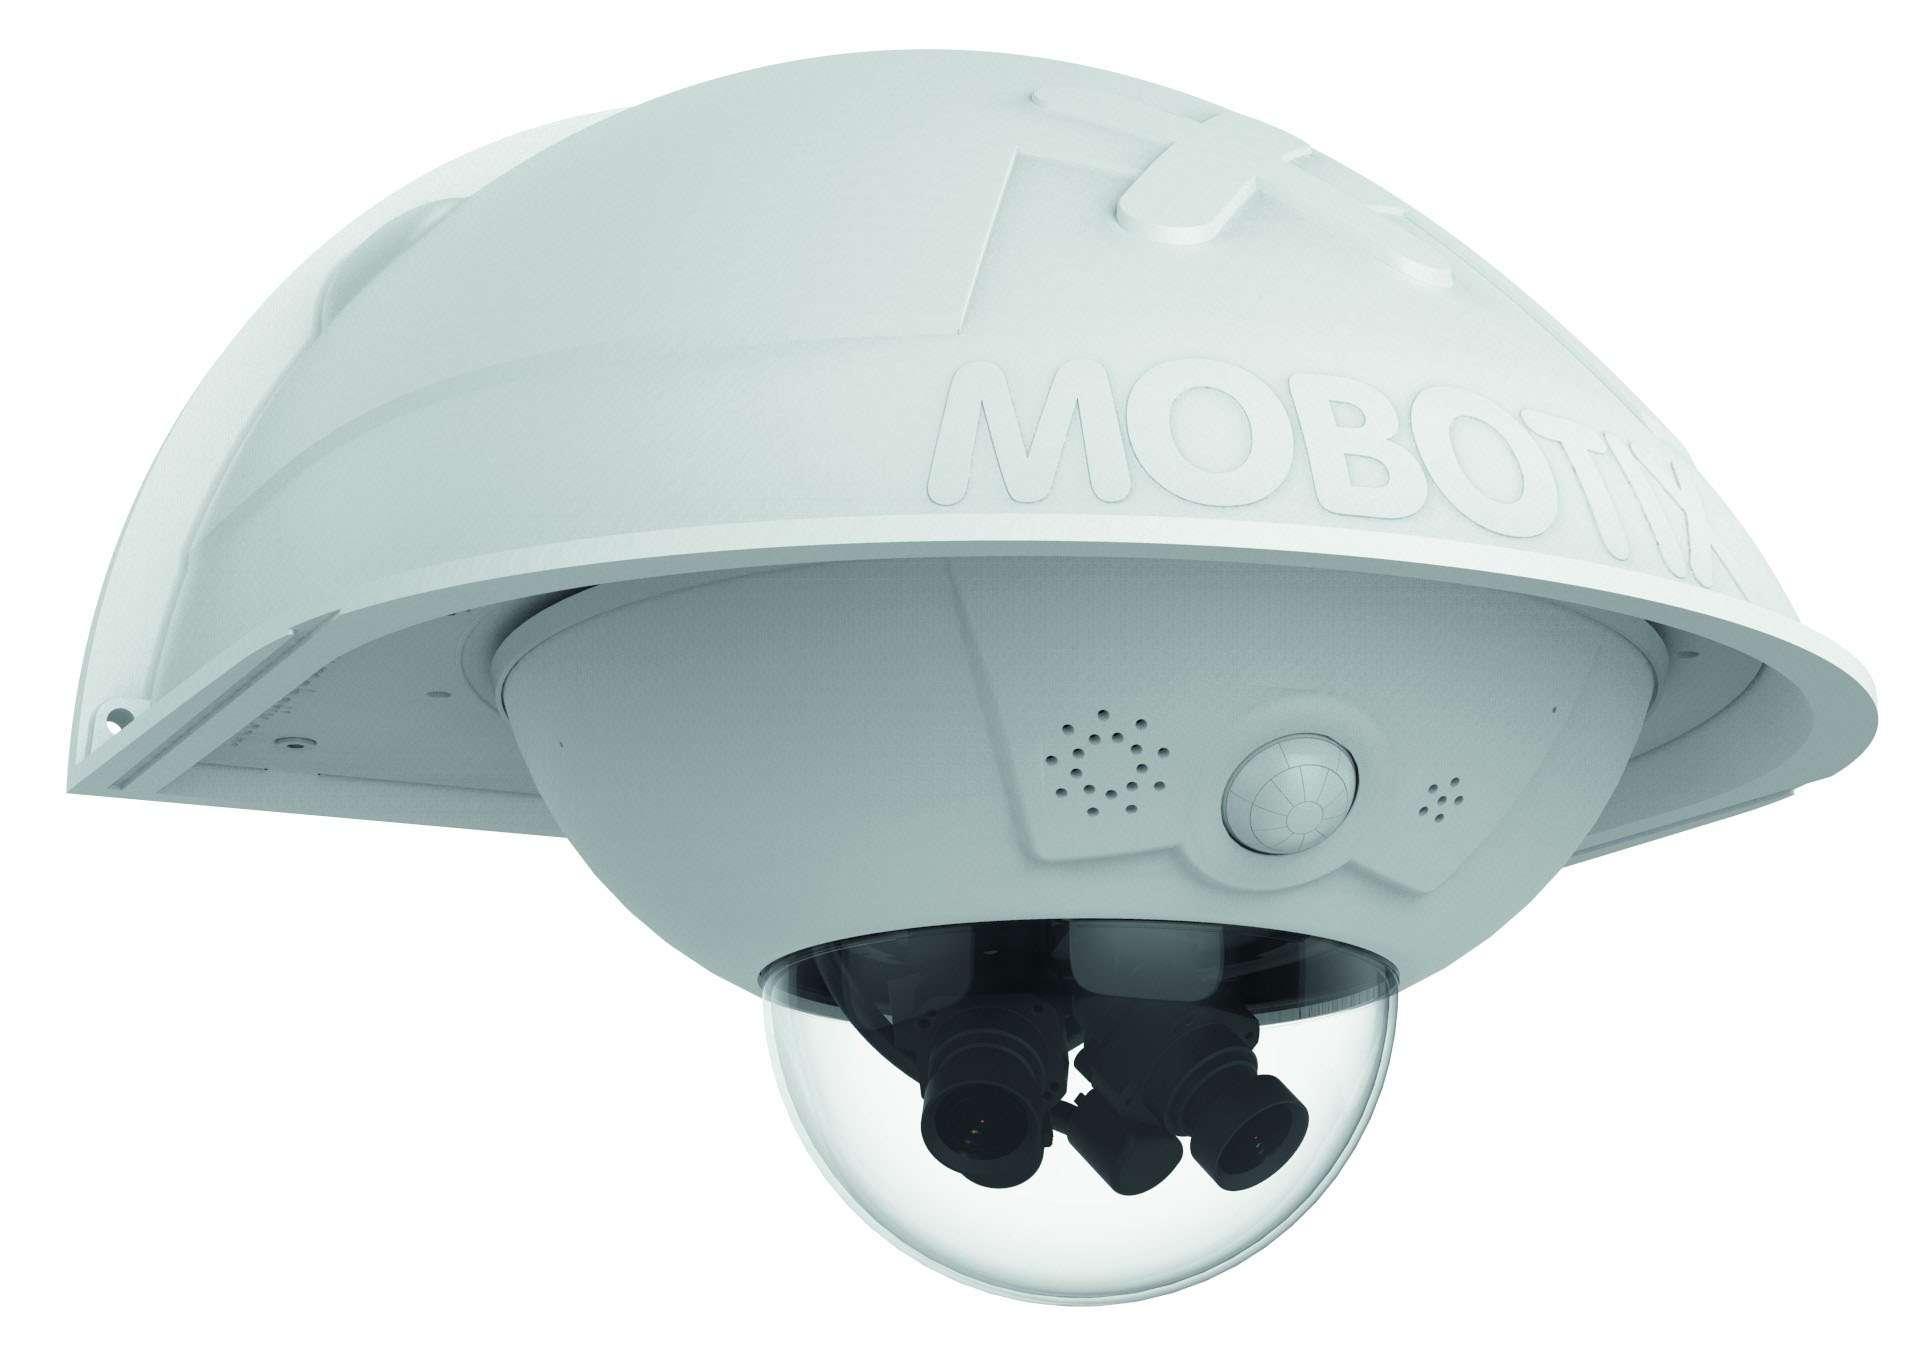 Mobotix D16B Body, For D16B/D15 Sensor Modules (Day/Night)